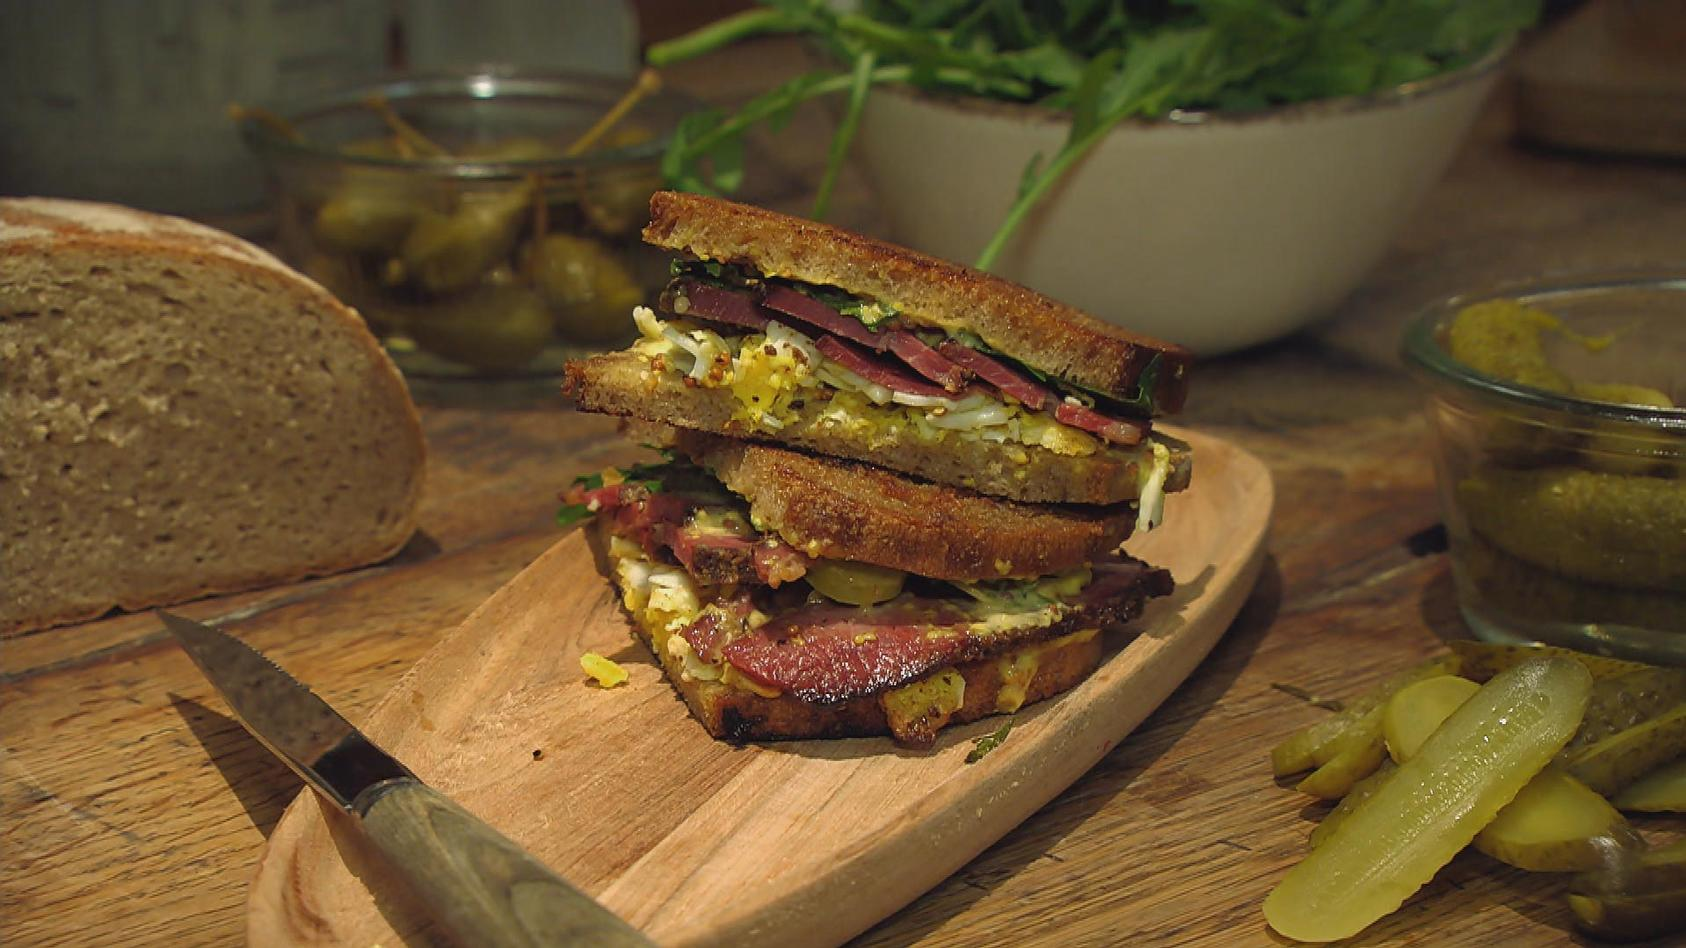 Hollywood Filmabend – Prominente Gerichte zum Nachkochen: Pastrami-Sandwich à la Harry and Sally